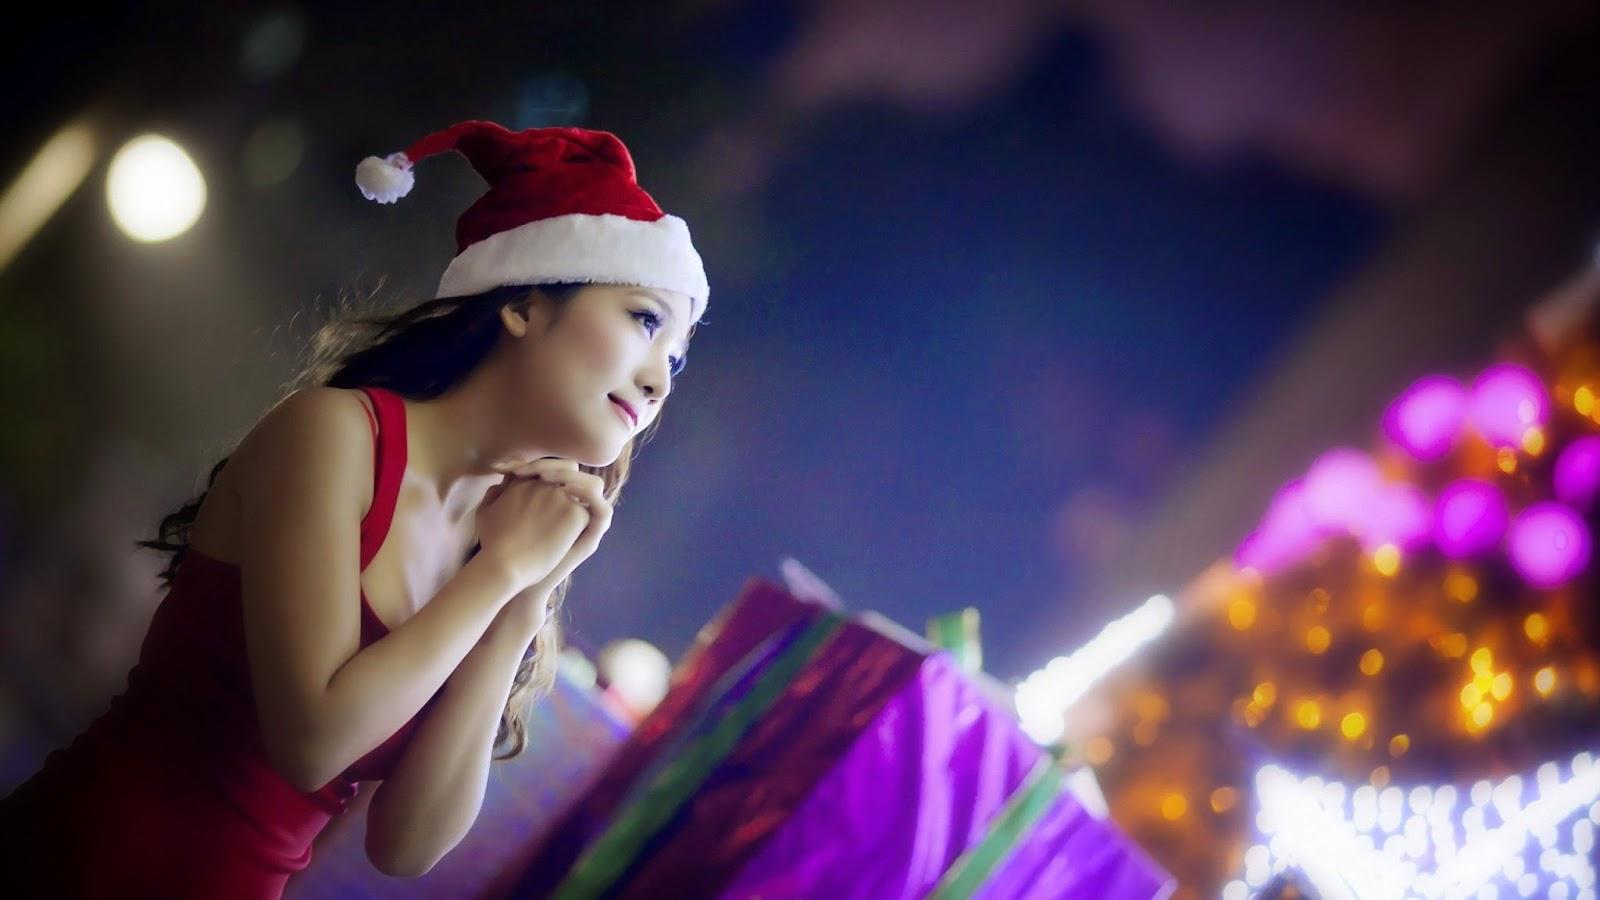 christmas | your blog description